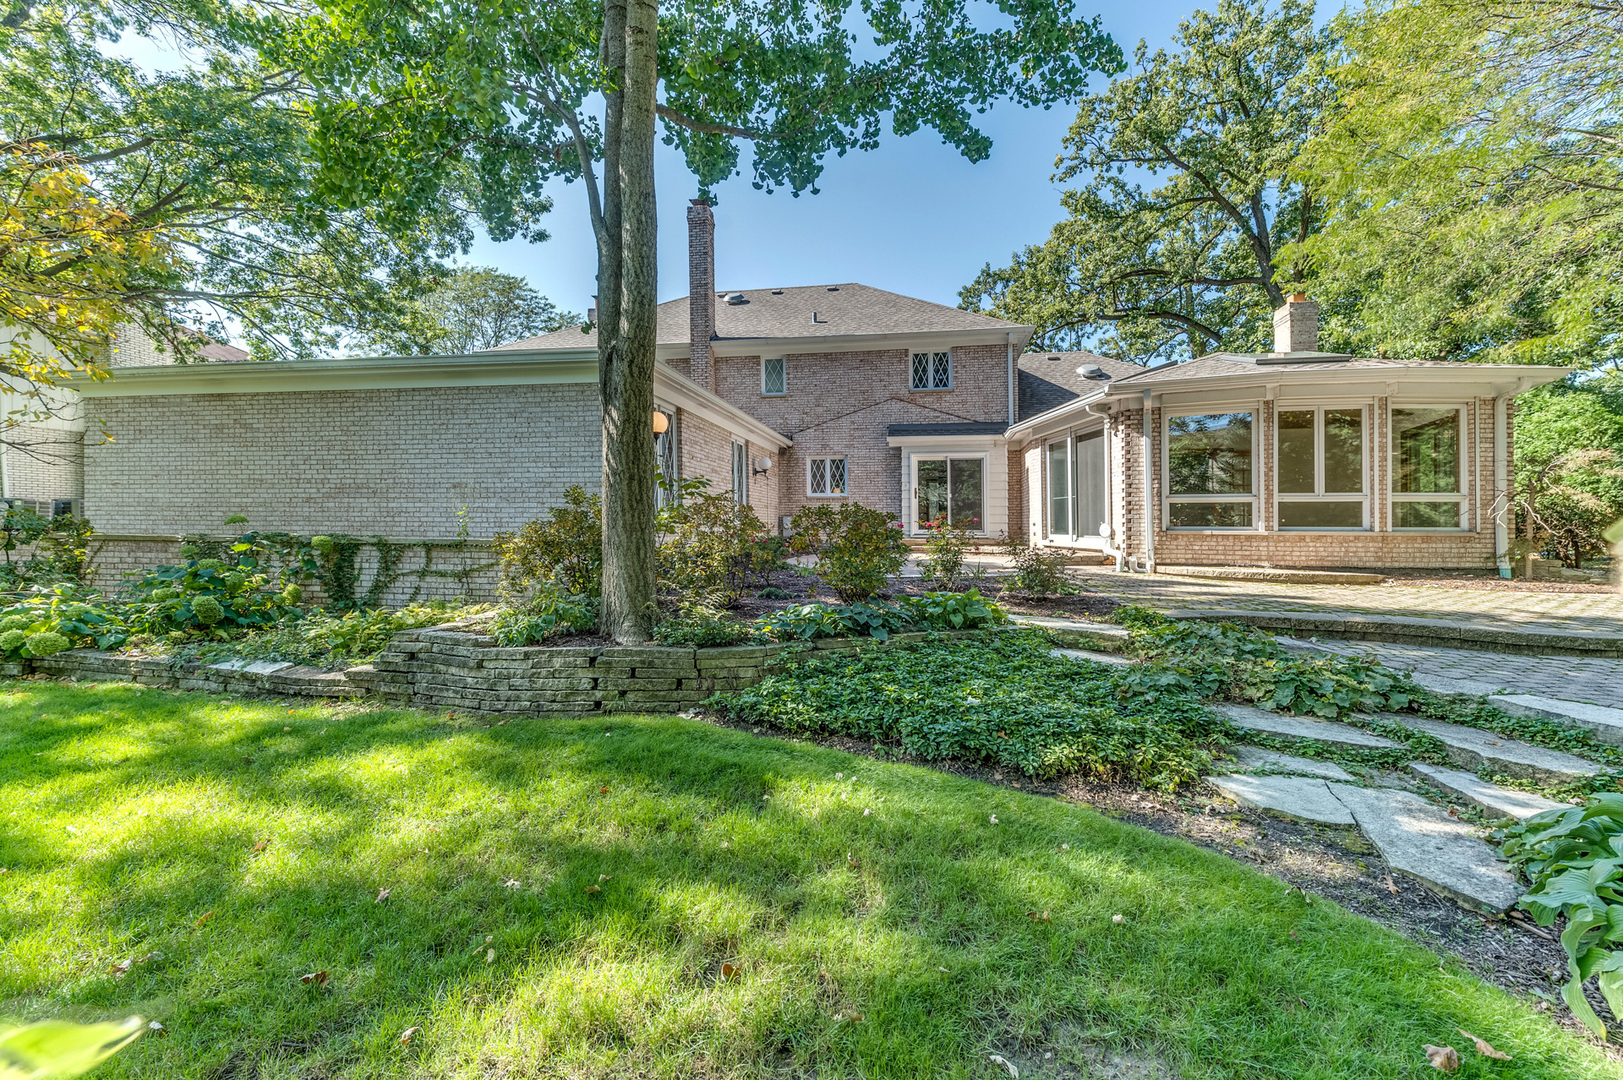 709 Forest Glen, Oak Brook, Illinois, 60523